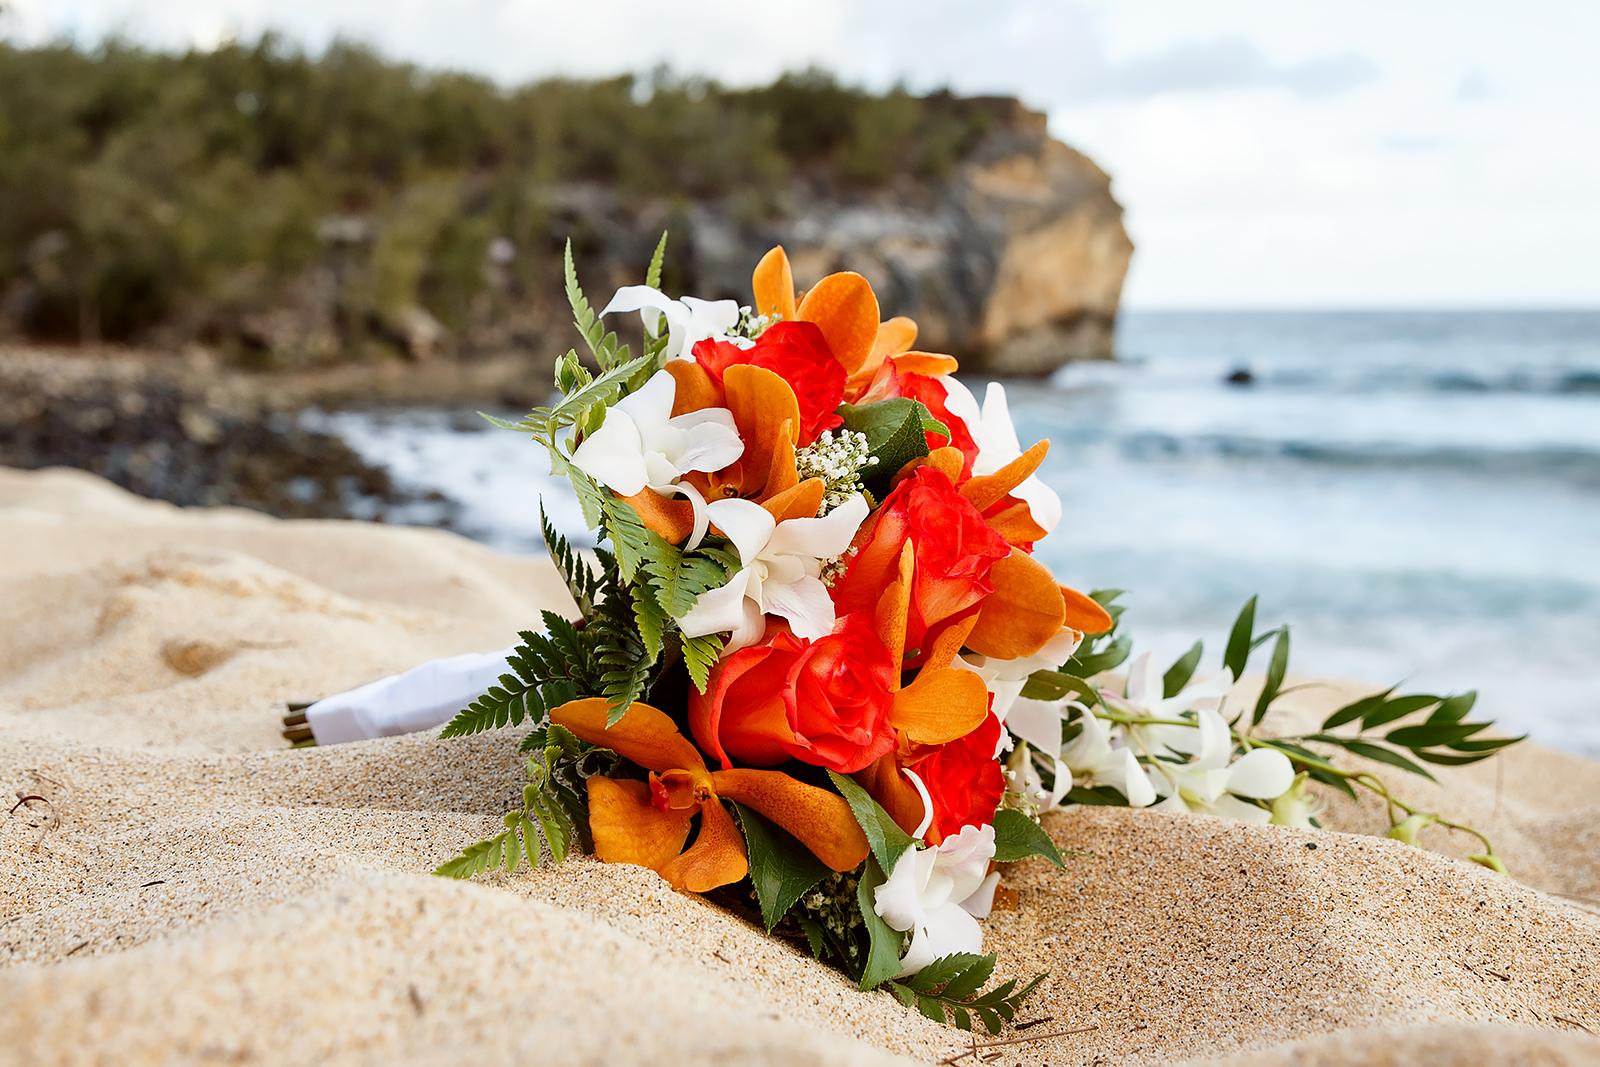 #2 Sunset Bouquet